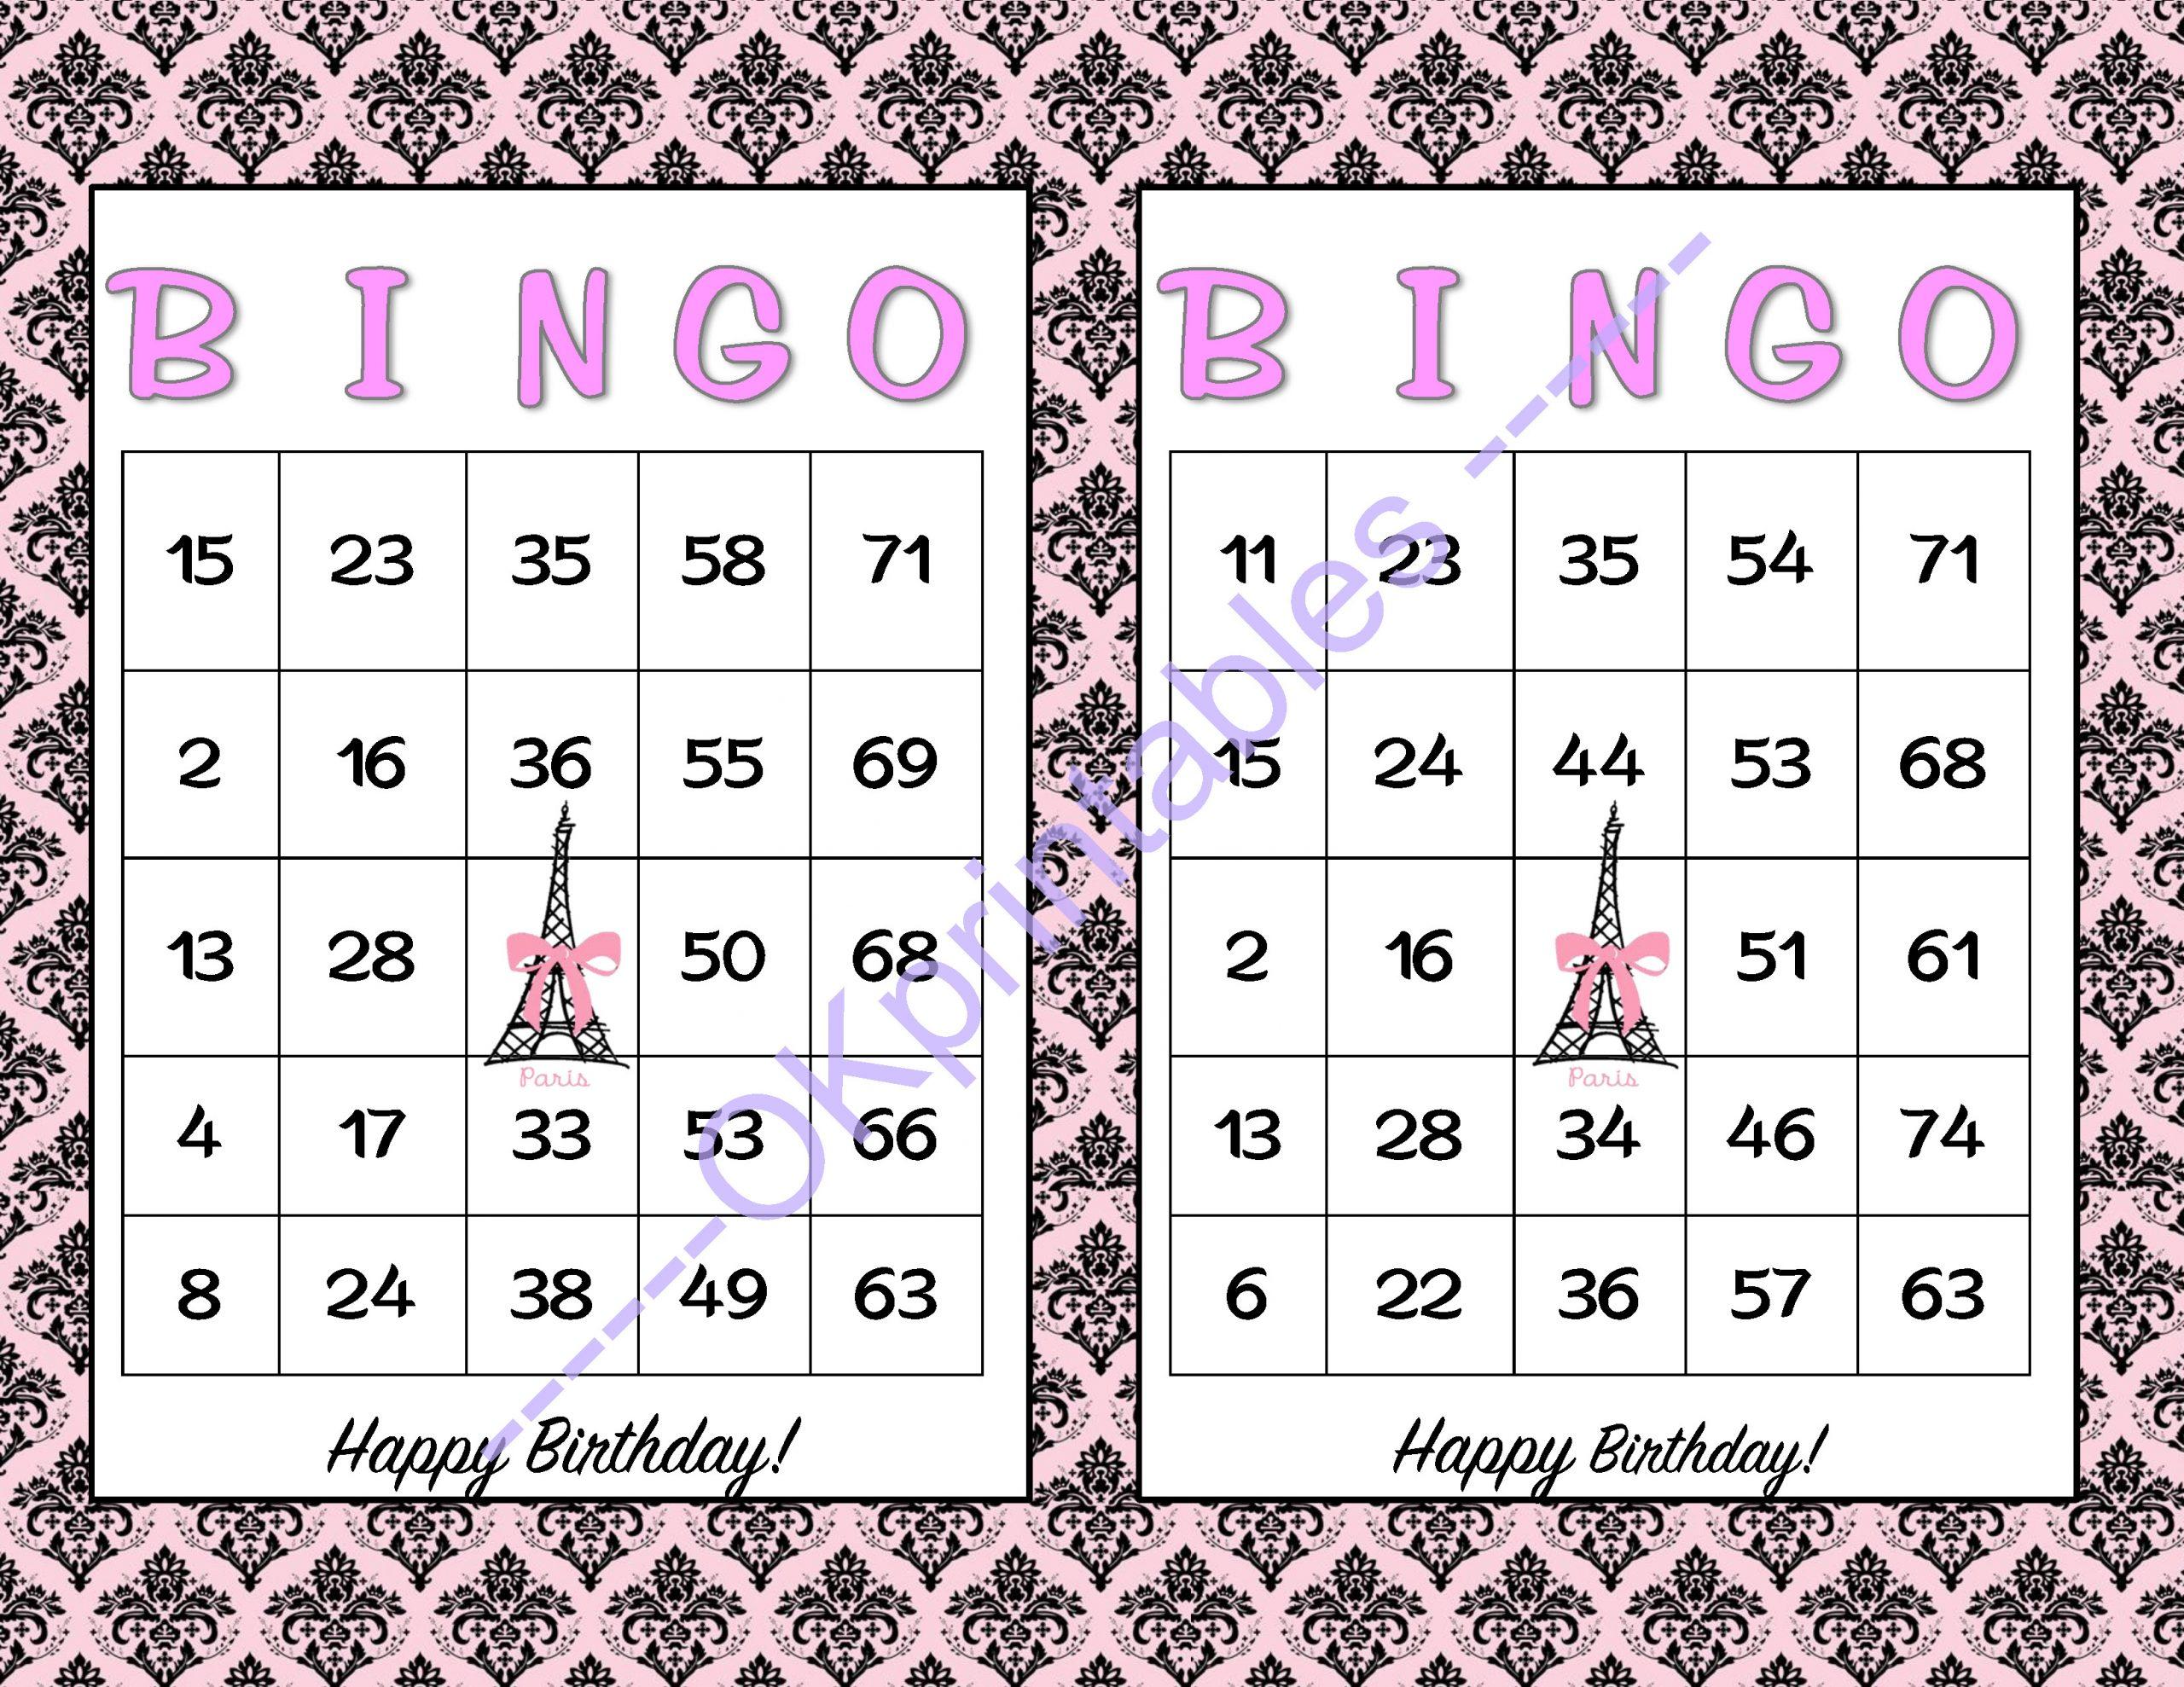 60 Happy Birthday Bingo Cards - Printable Girl Game Paris Theme Party -  Pink And Black Paris Party - Girl Party Game Soldokprintables